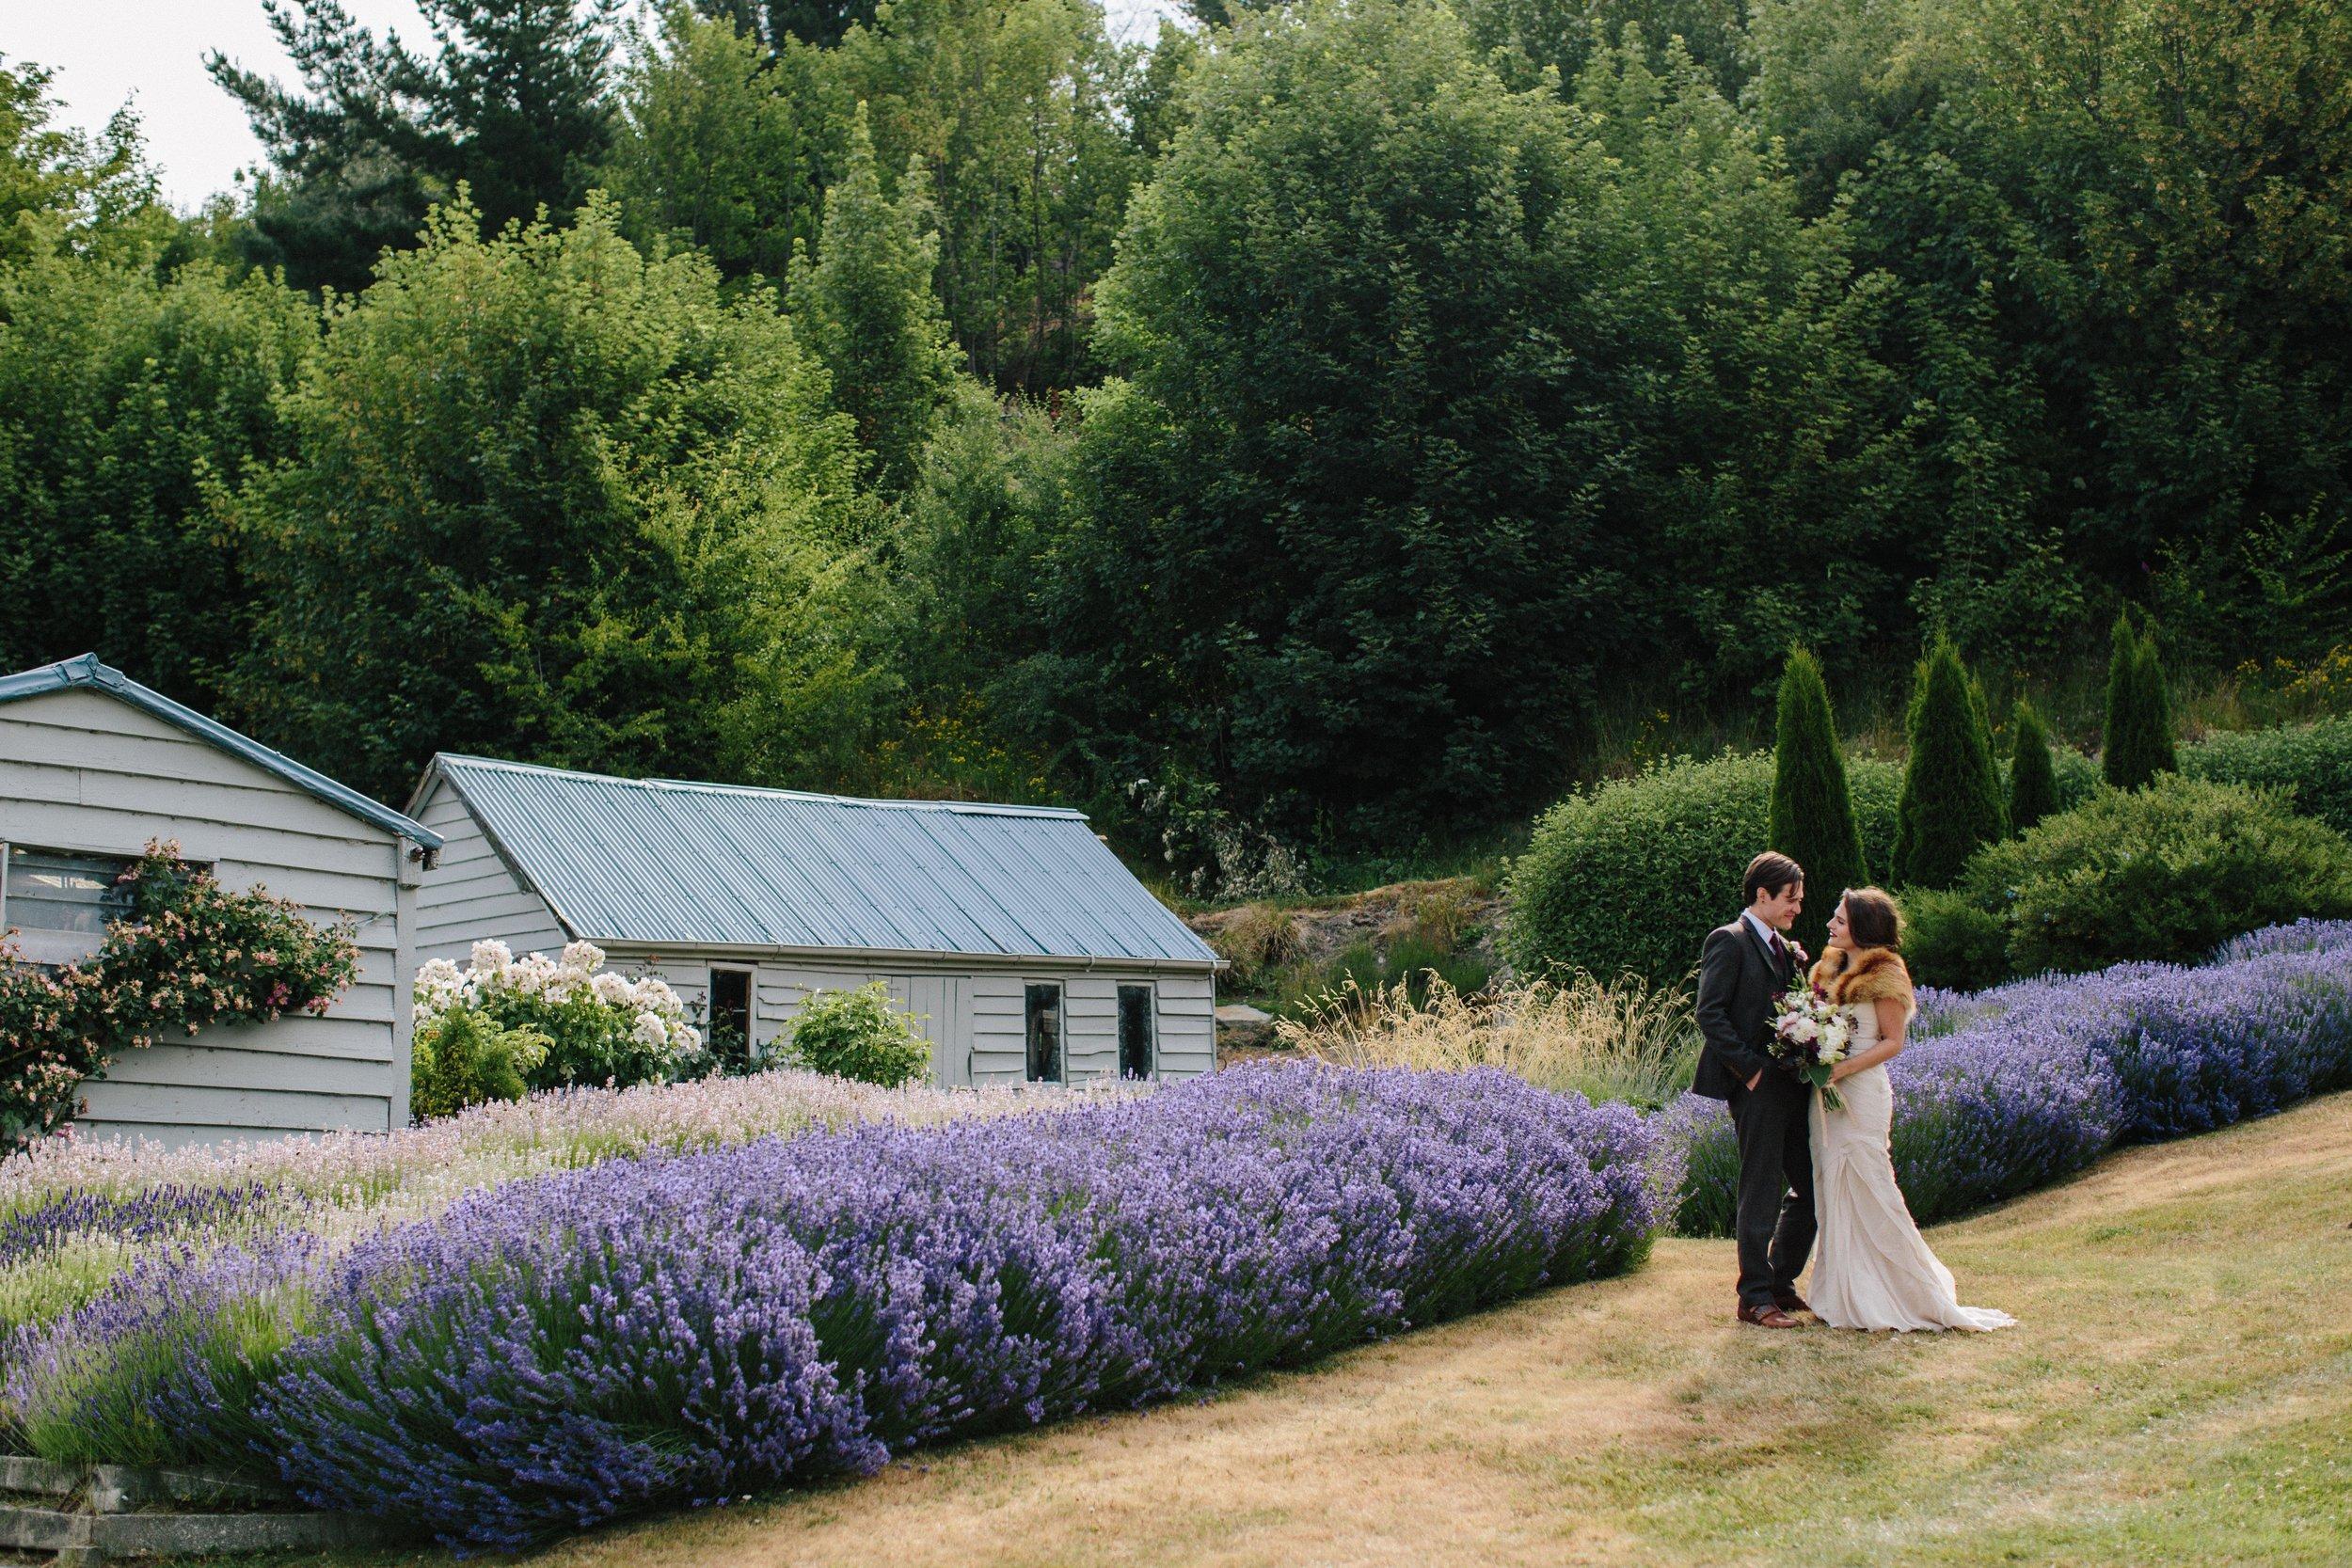 Lavender-Farm-New Zealand-Elopement-Bride-Groom.jpg